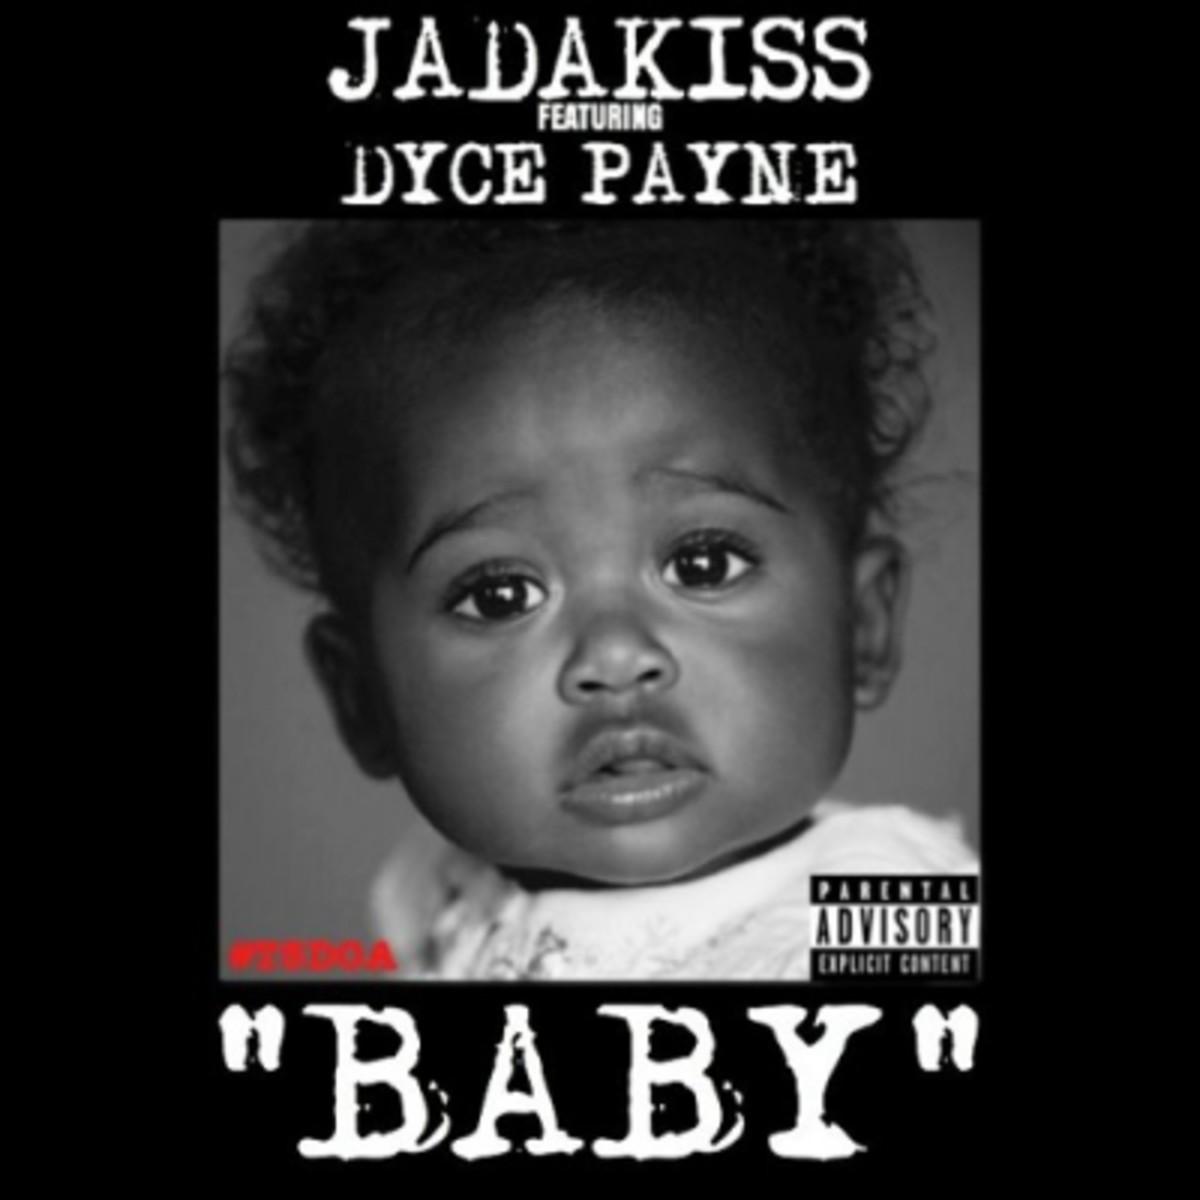 jadakiss-baby.jpg